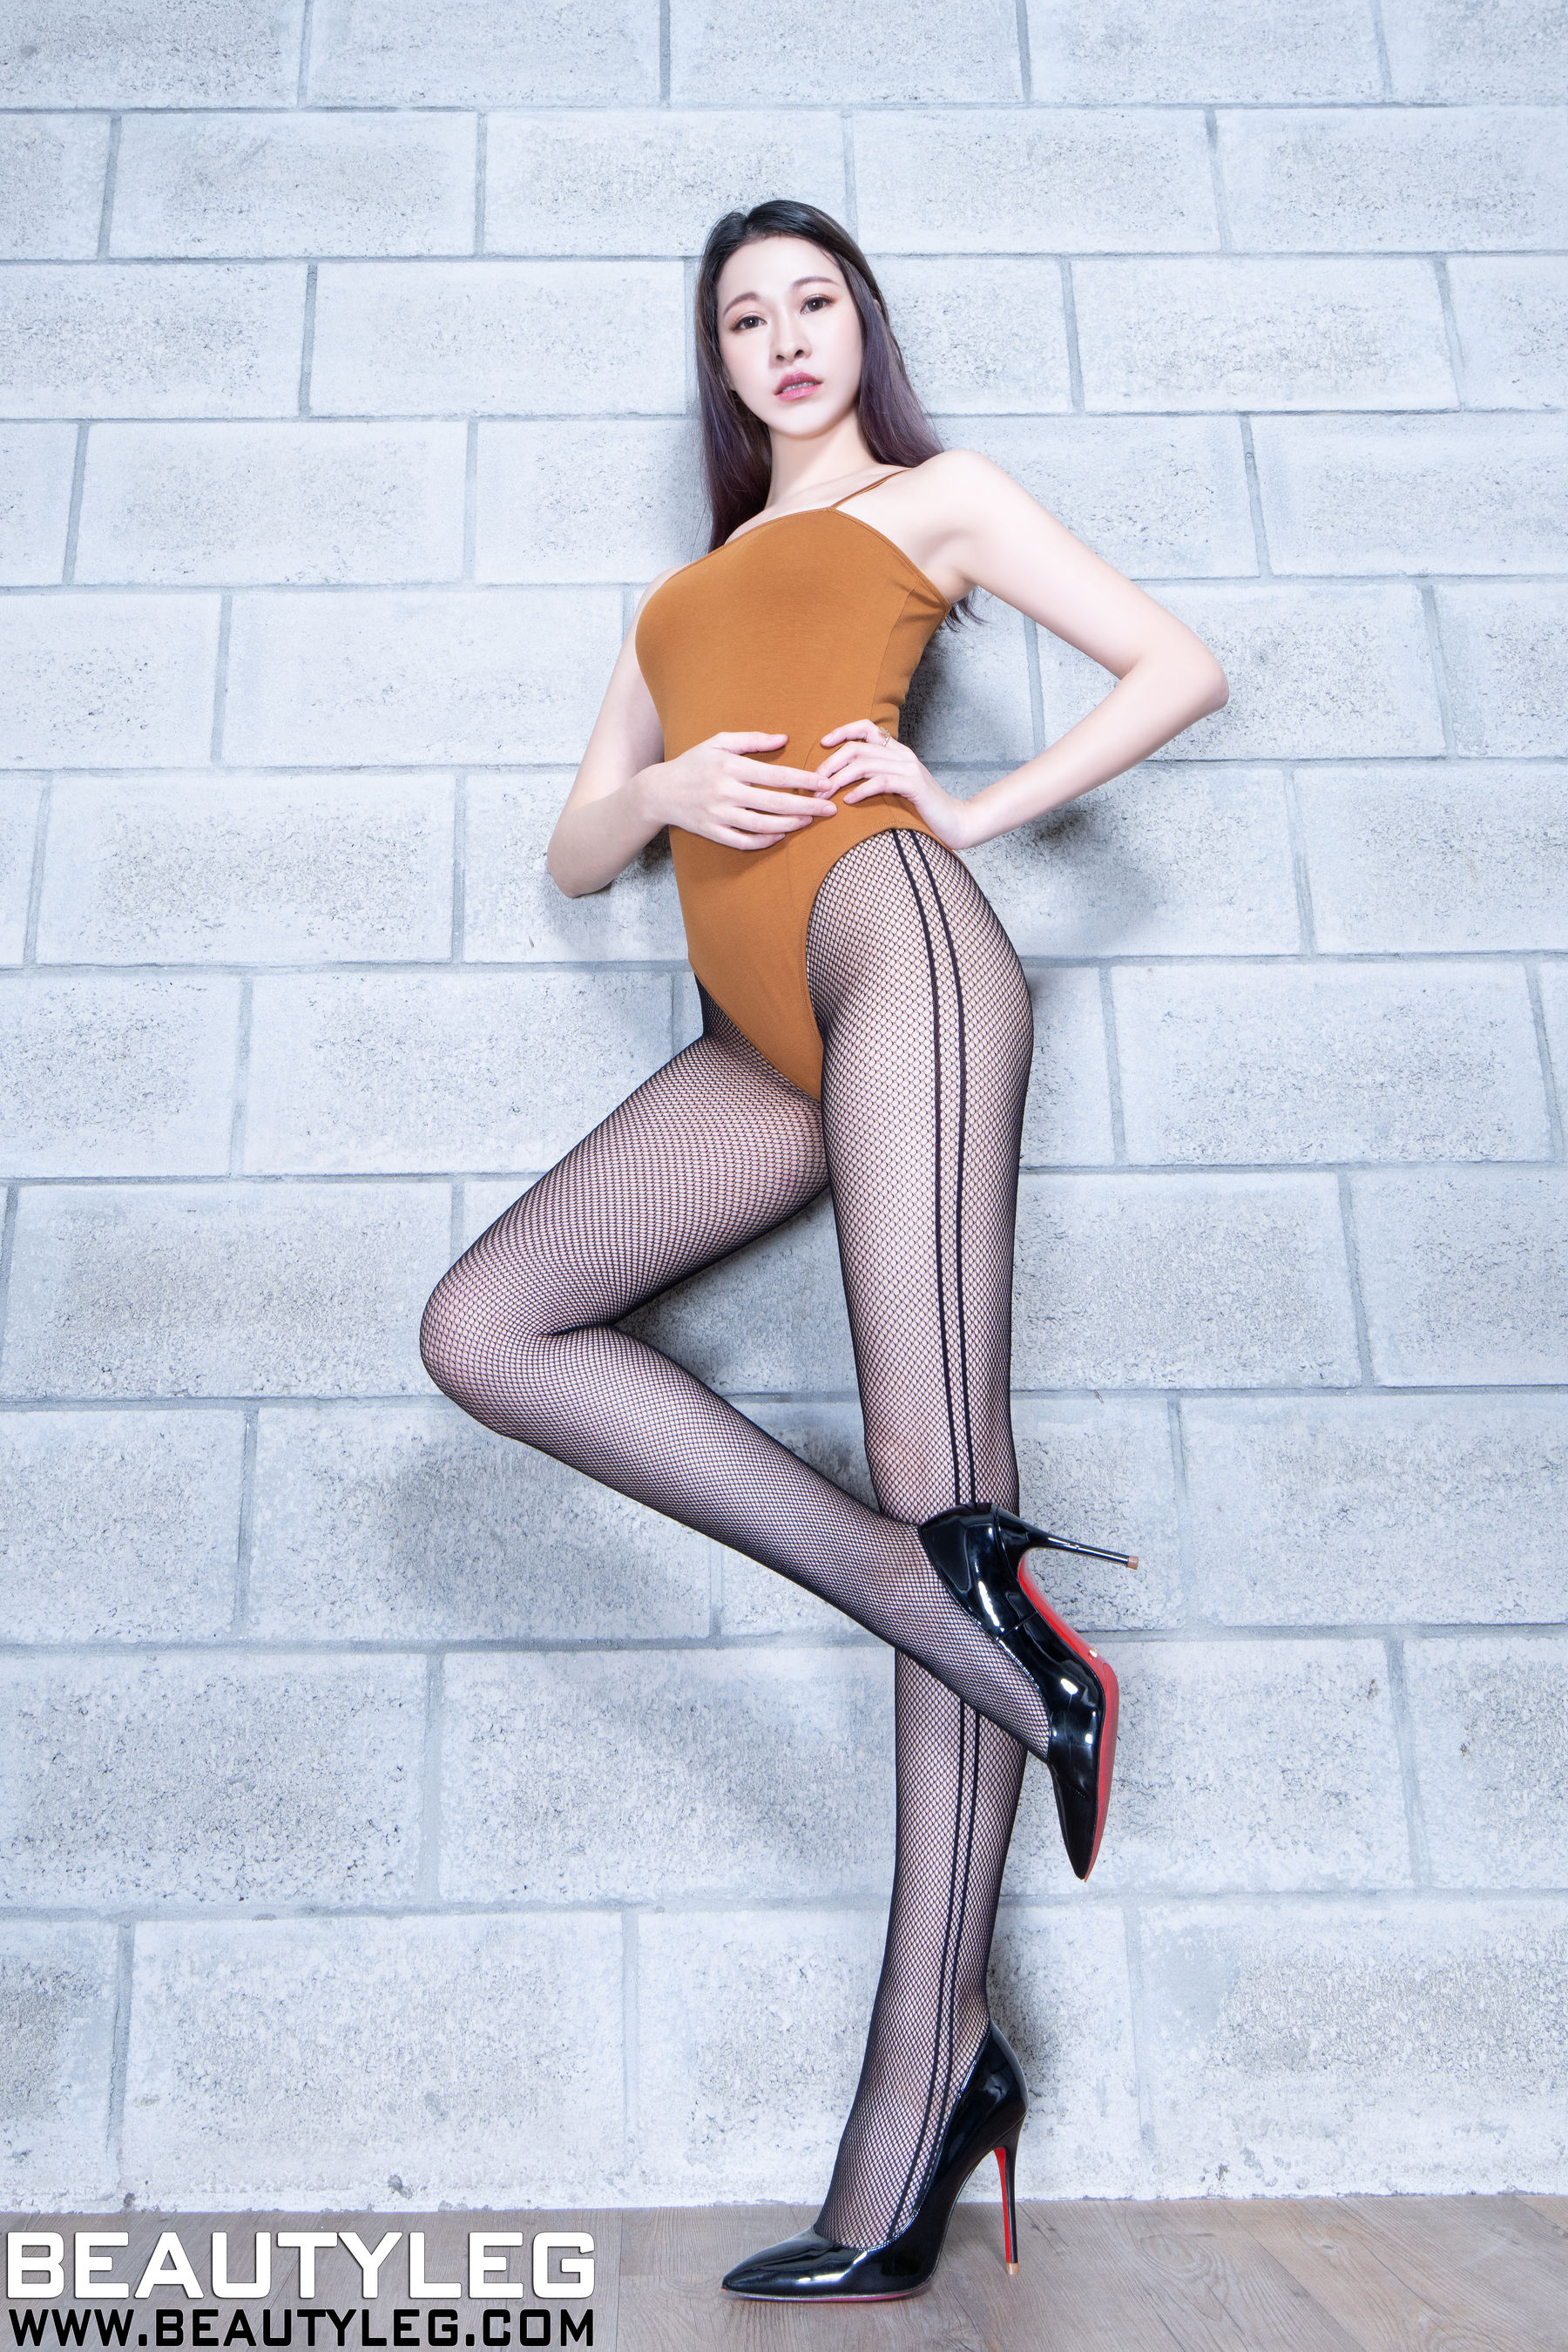 VOL.1493 [Beautyleg]高跟美腿:黄镫娴(腿模Neko)高品质写真套图(48P)